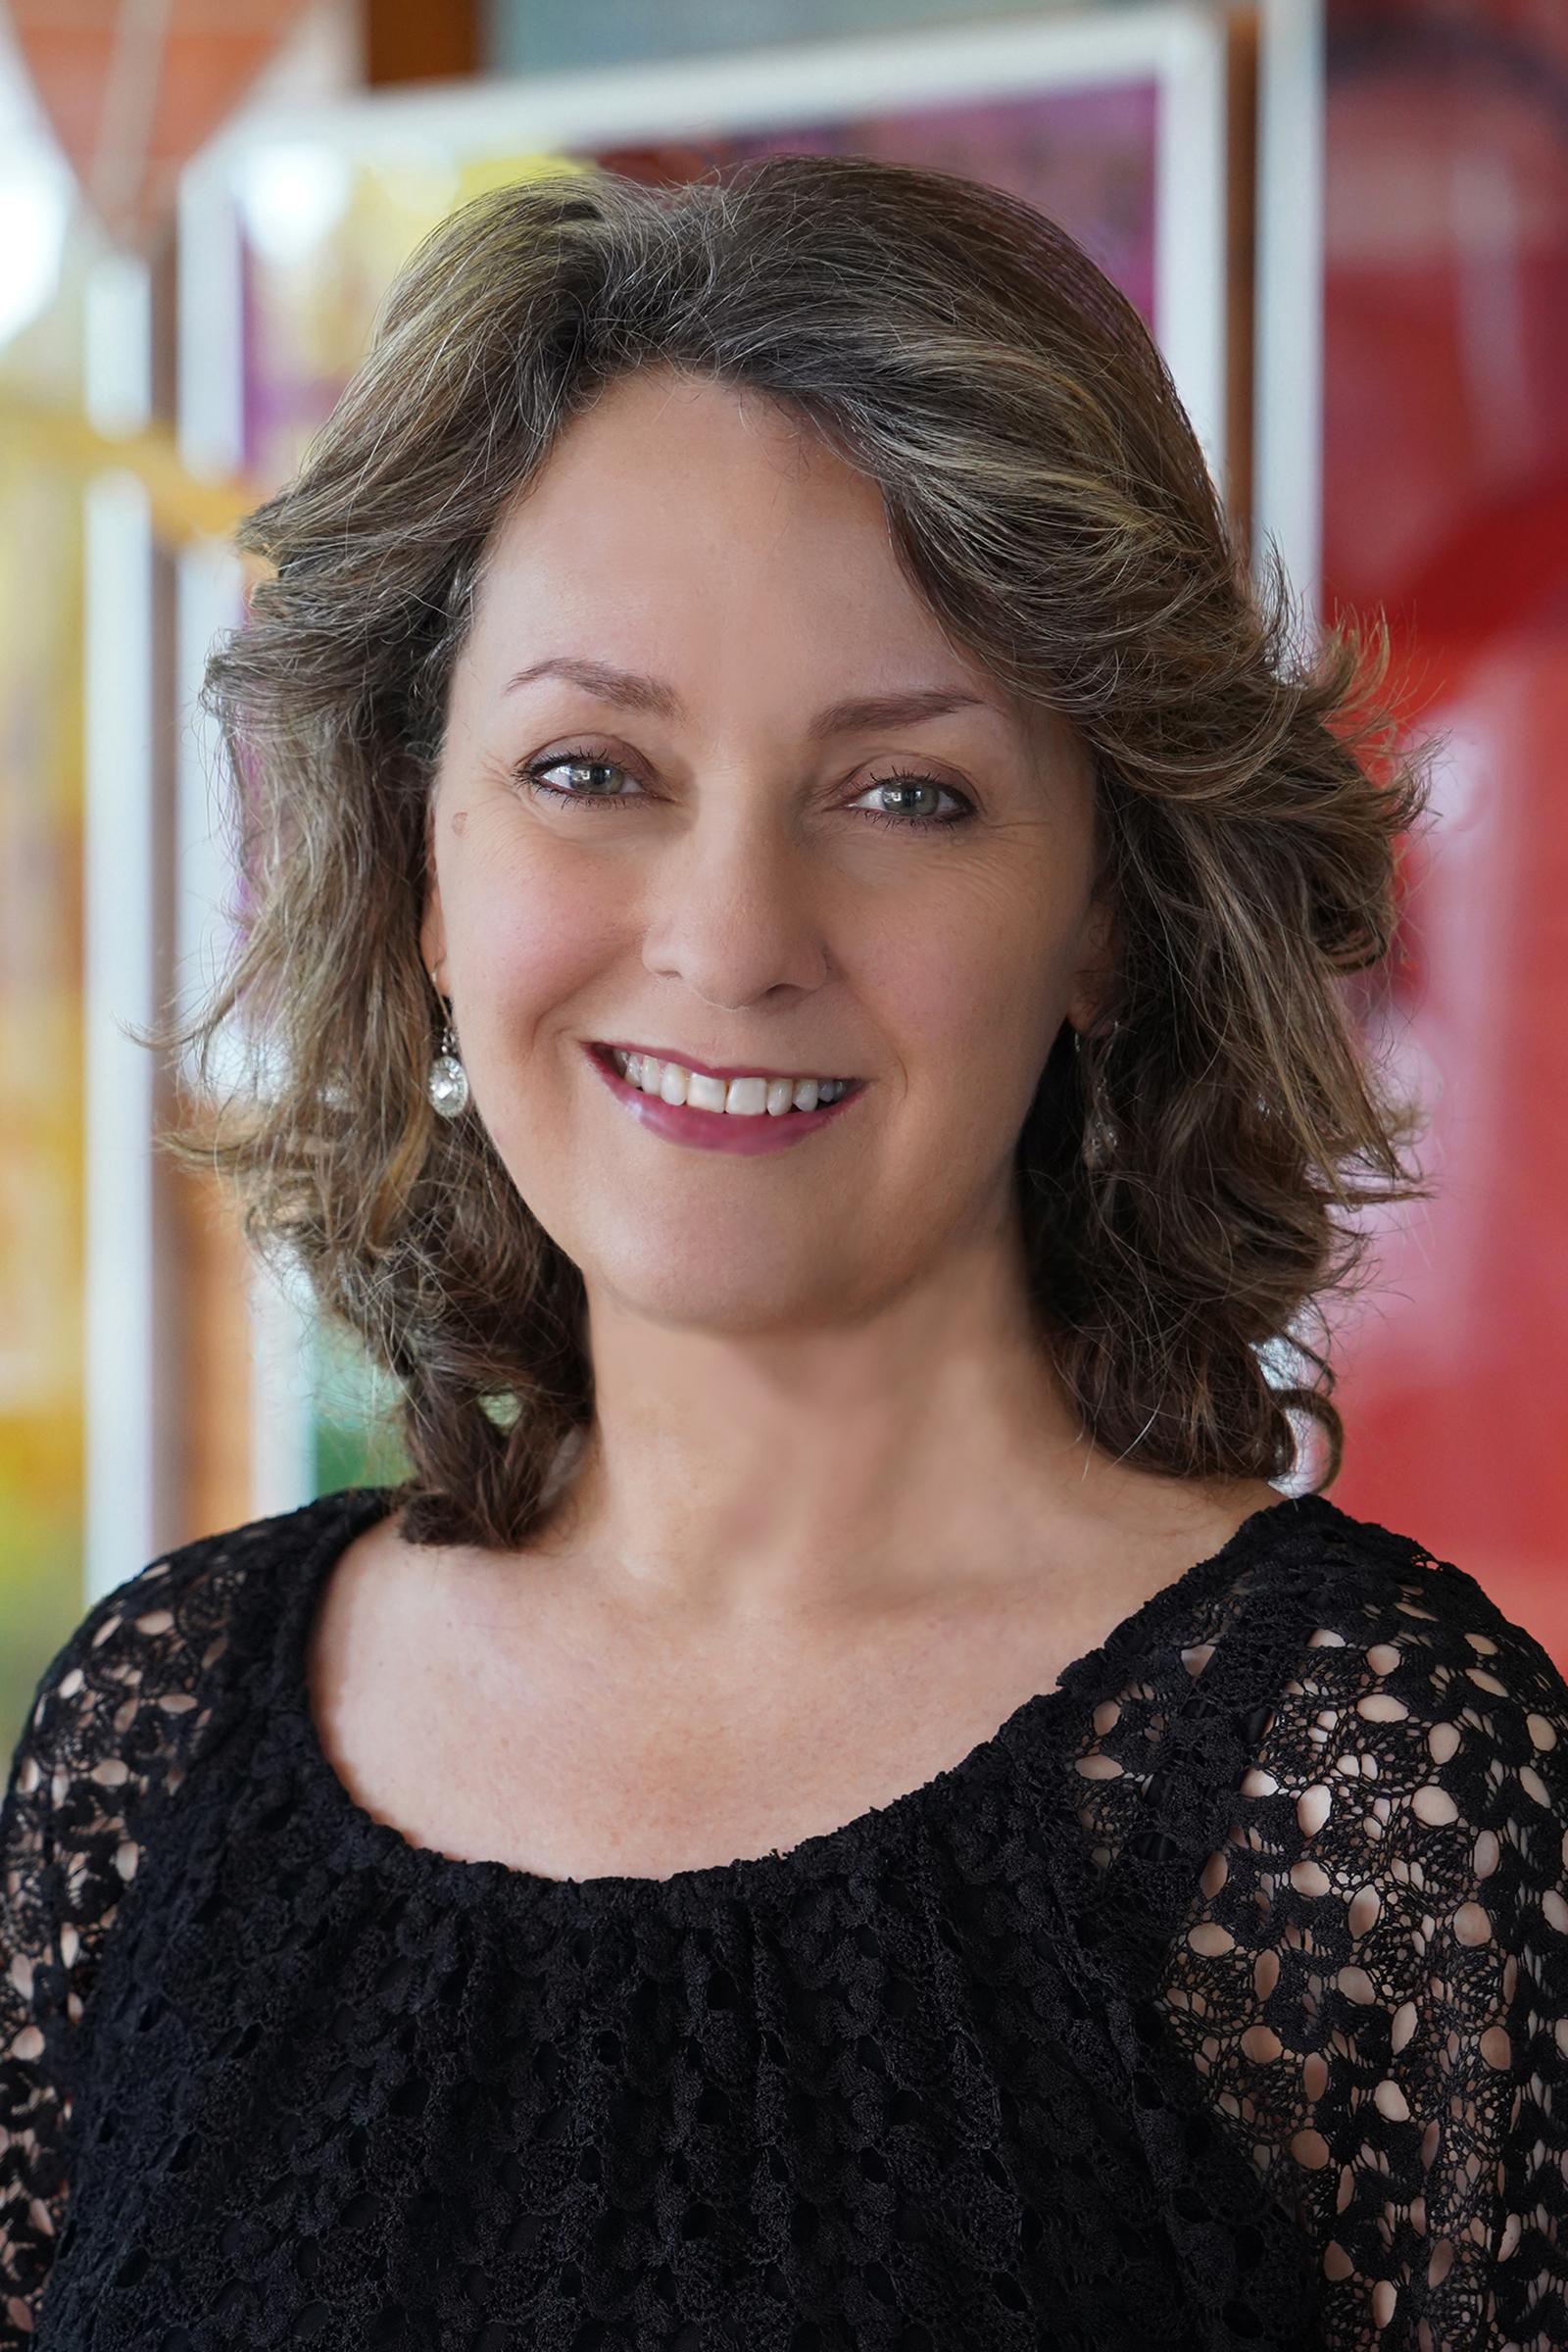 Susan W. Blaakman, PhD, RN, PMHNP-BC, FNAP